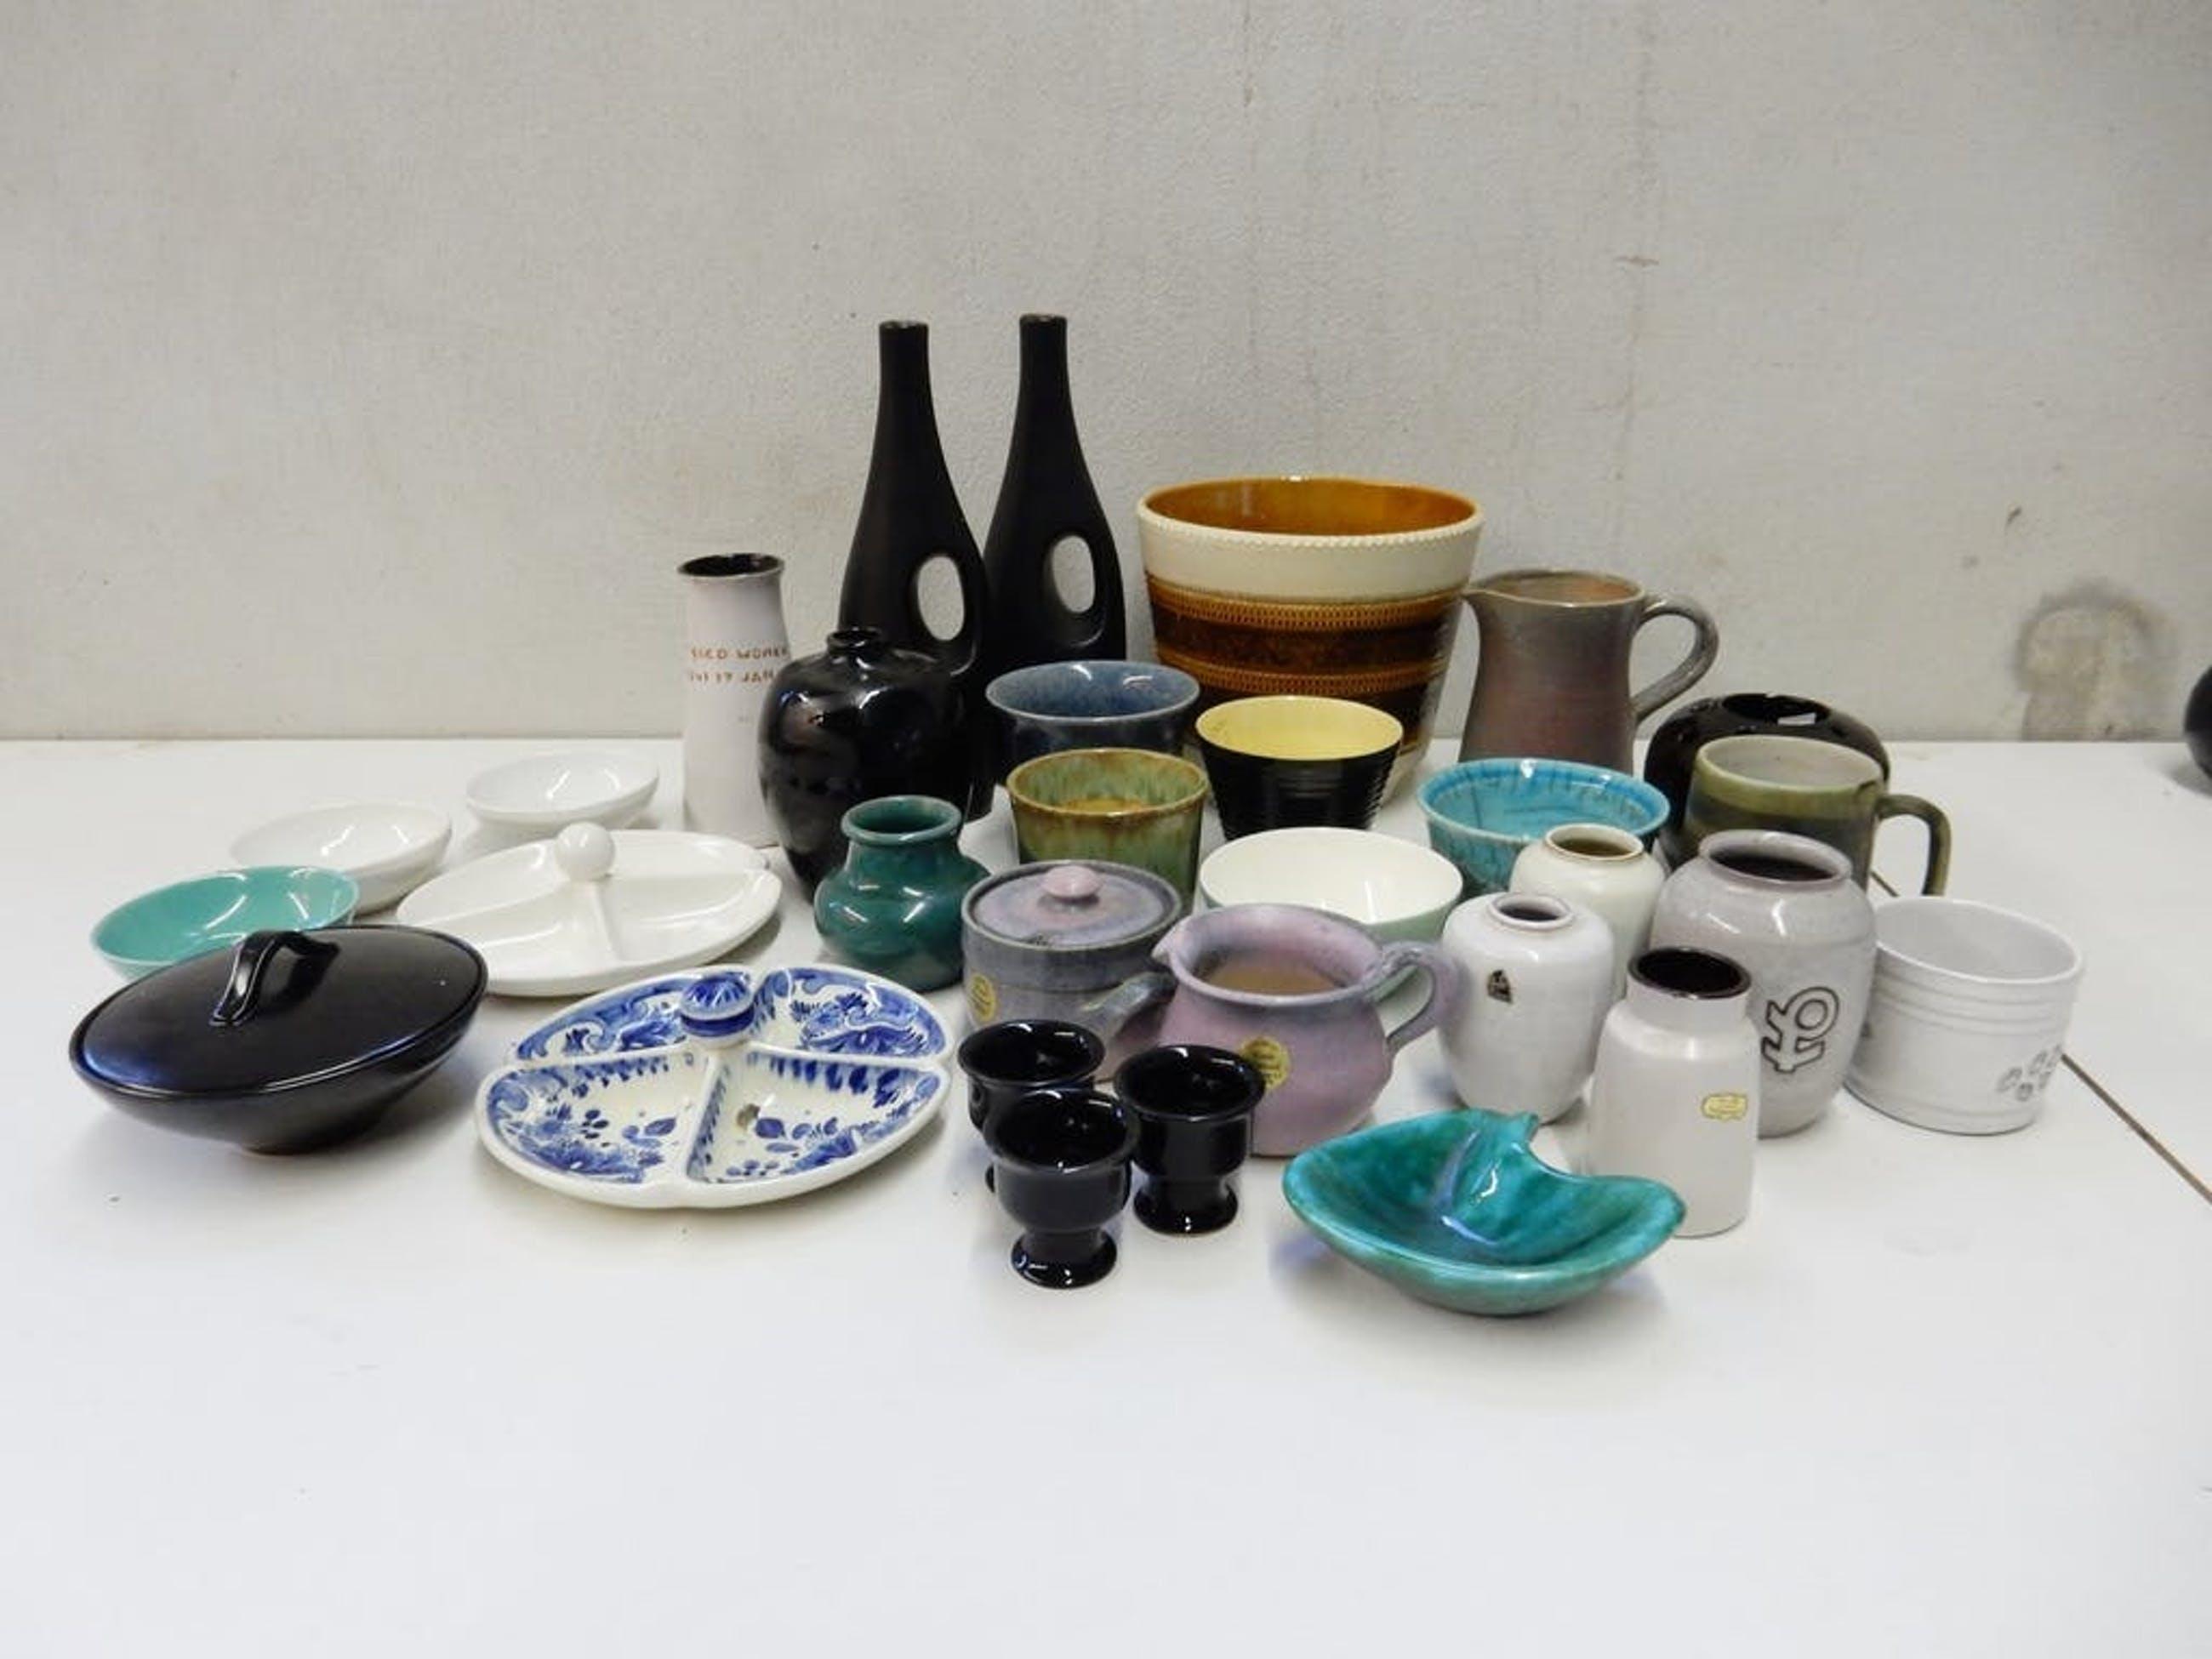 Verrassend Potterie Ravelli - Collectie puntgave keramiek: Jaap Ravelli e.a. YW-33